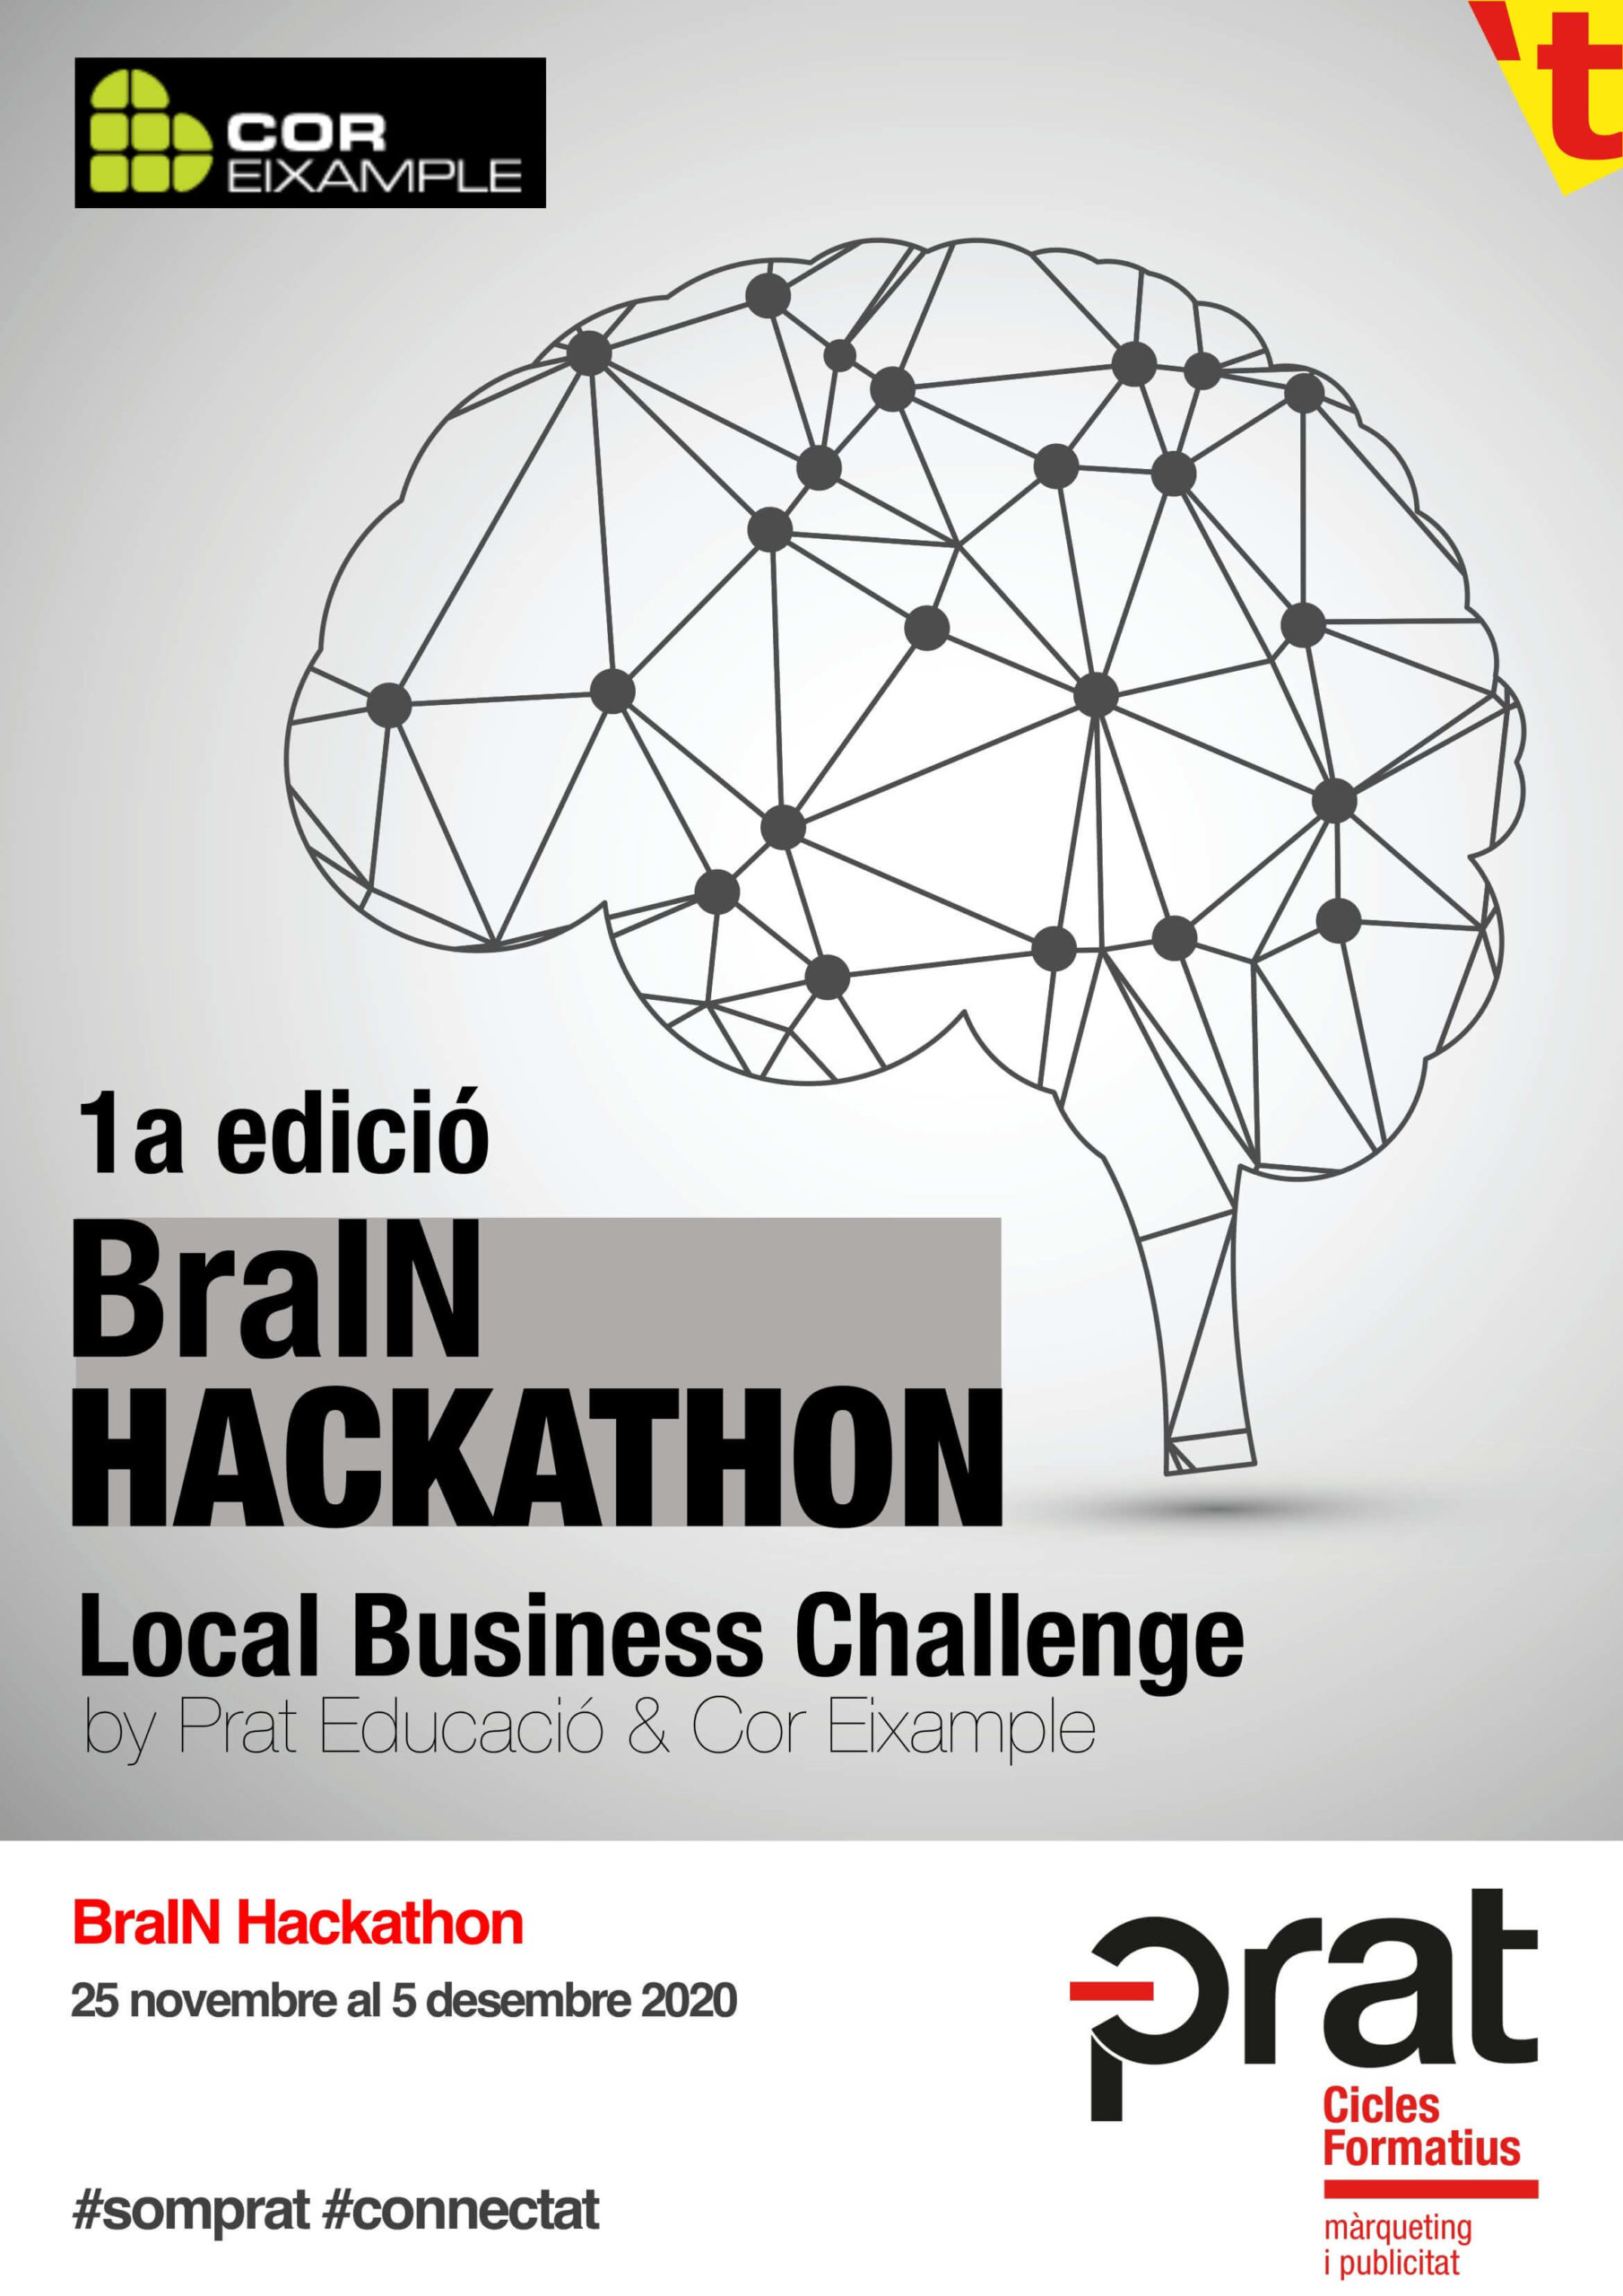 1a edició BraIN Hackathon Local Business Challenge by Prat Educació & Cor Eixample